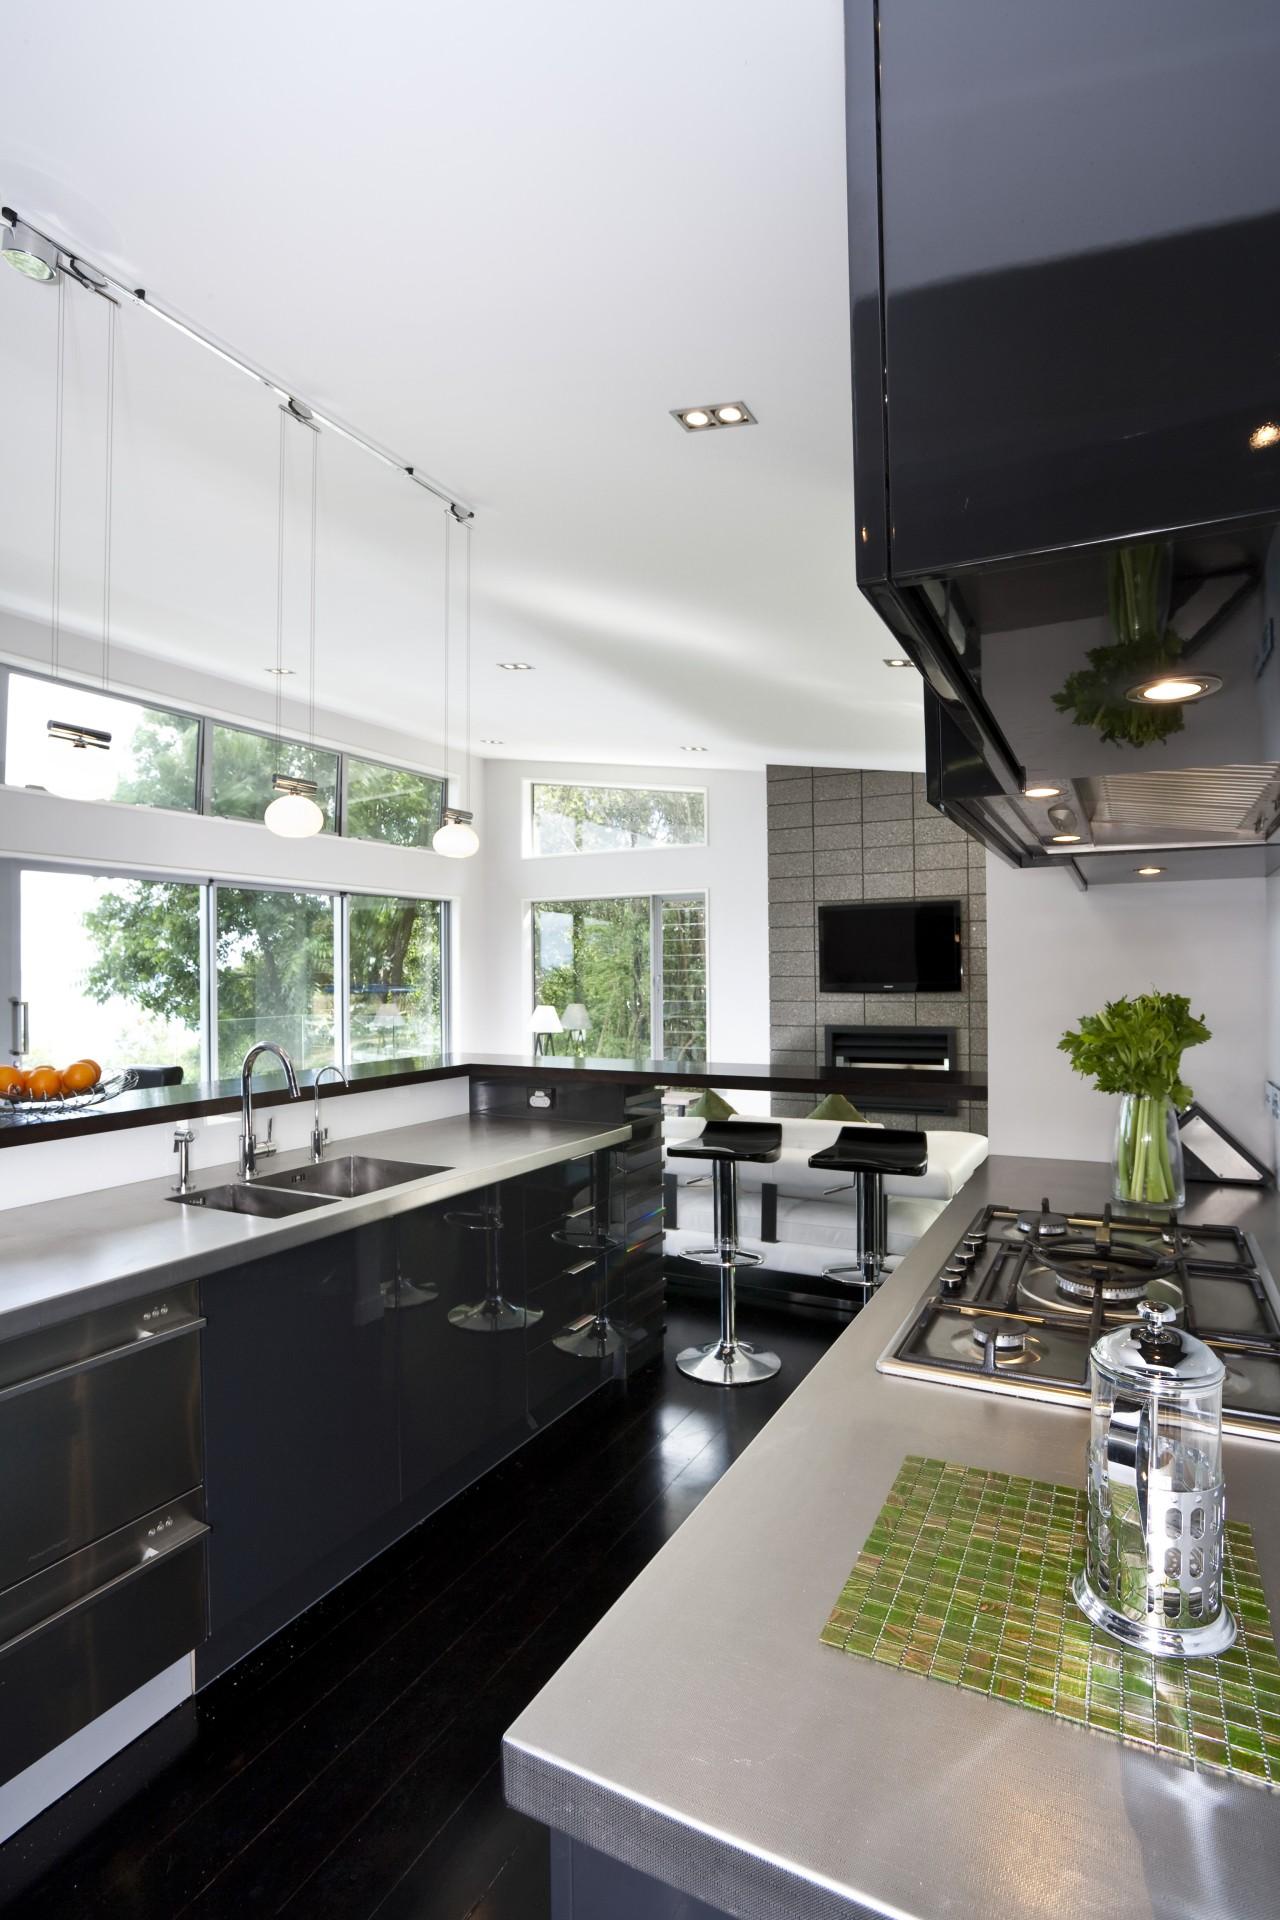 View of kitchen designed by Celia Visser of countertop, house, interior design, kitchen, white, gray, black